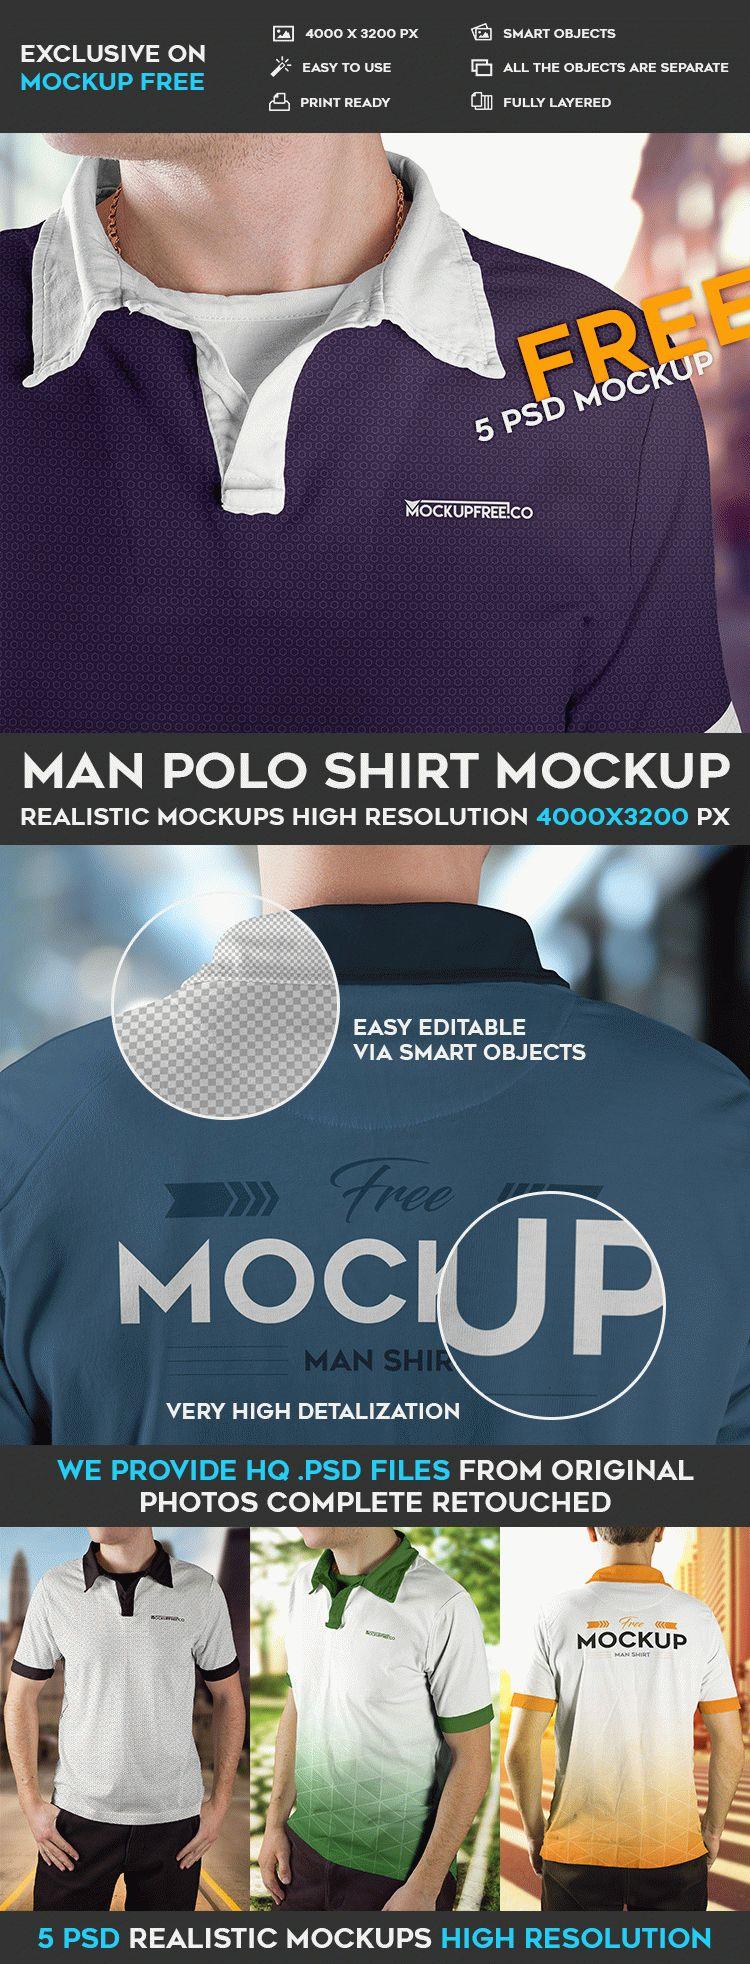 Man Polo Shirt - 5 Free PSD Mockups